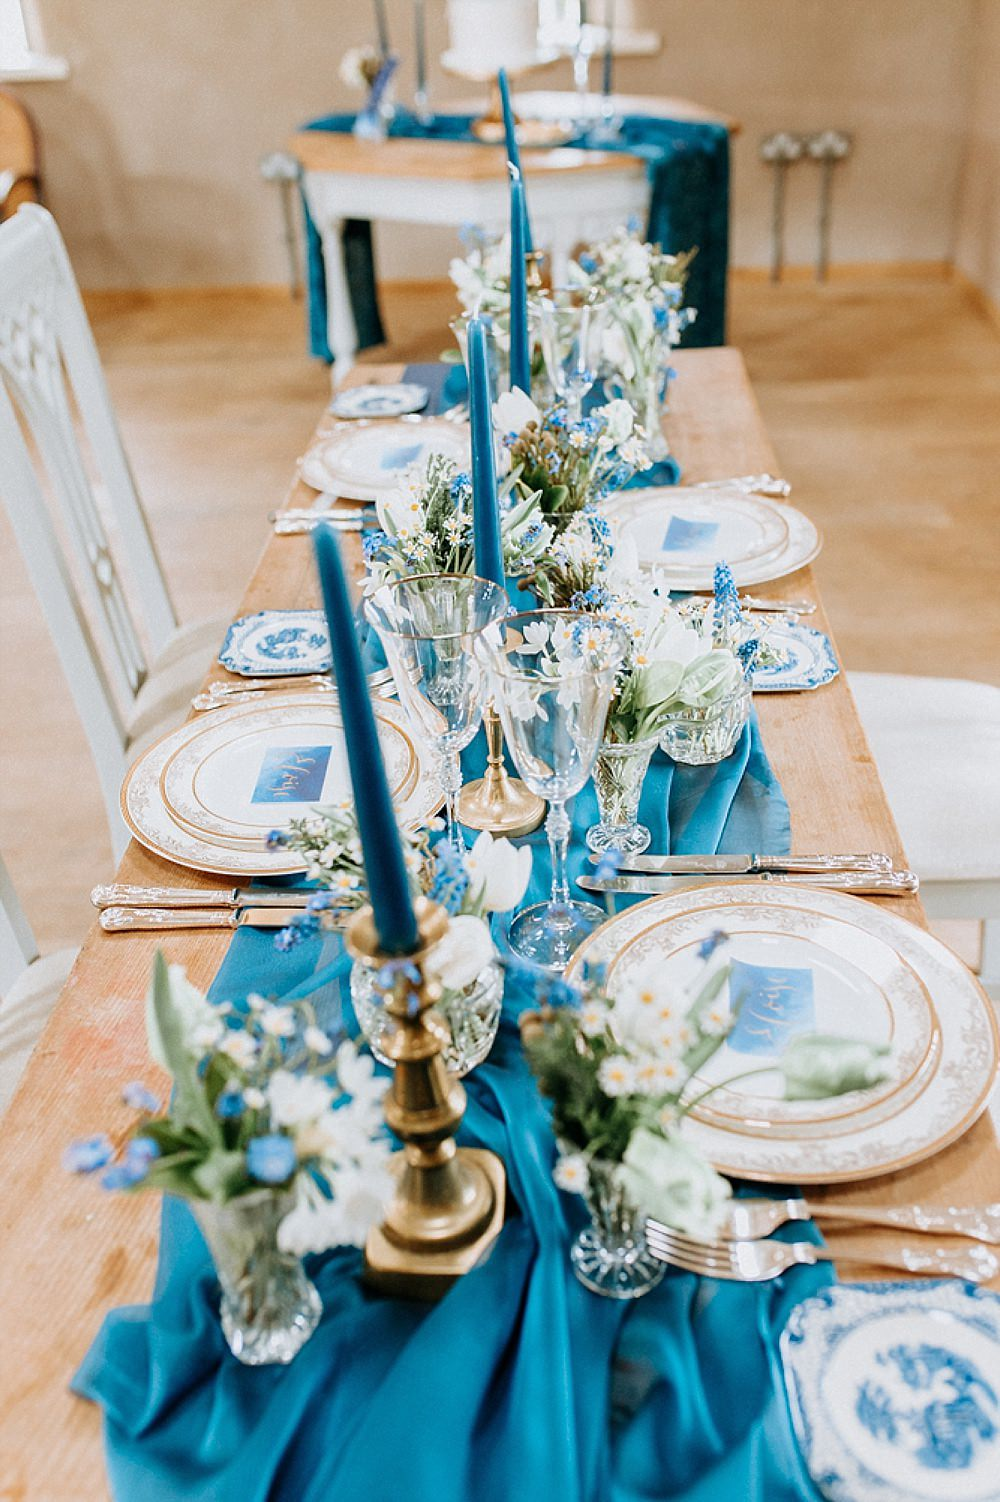 Table Tablescape Decor Decoration Runner Silk Candlesticks Flowers Blue Gold Wedding Ideas Ailsa Reeve Photography